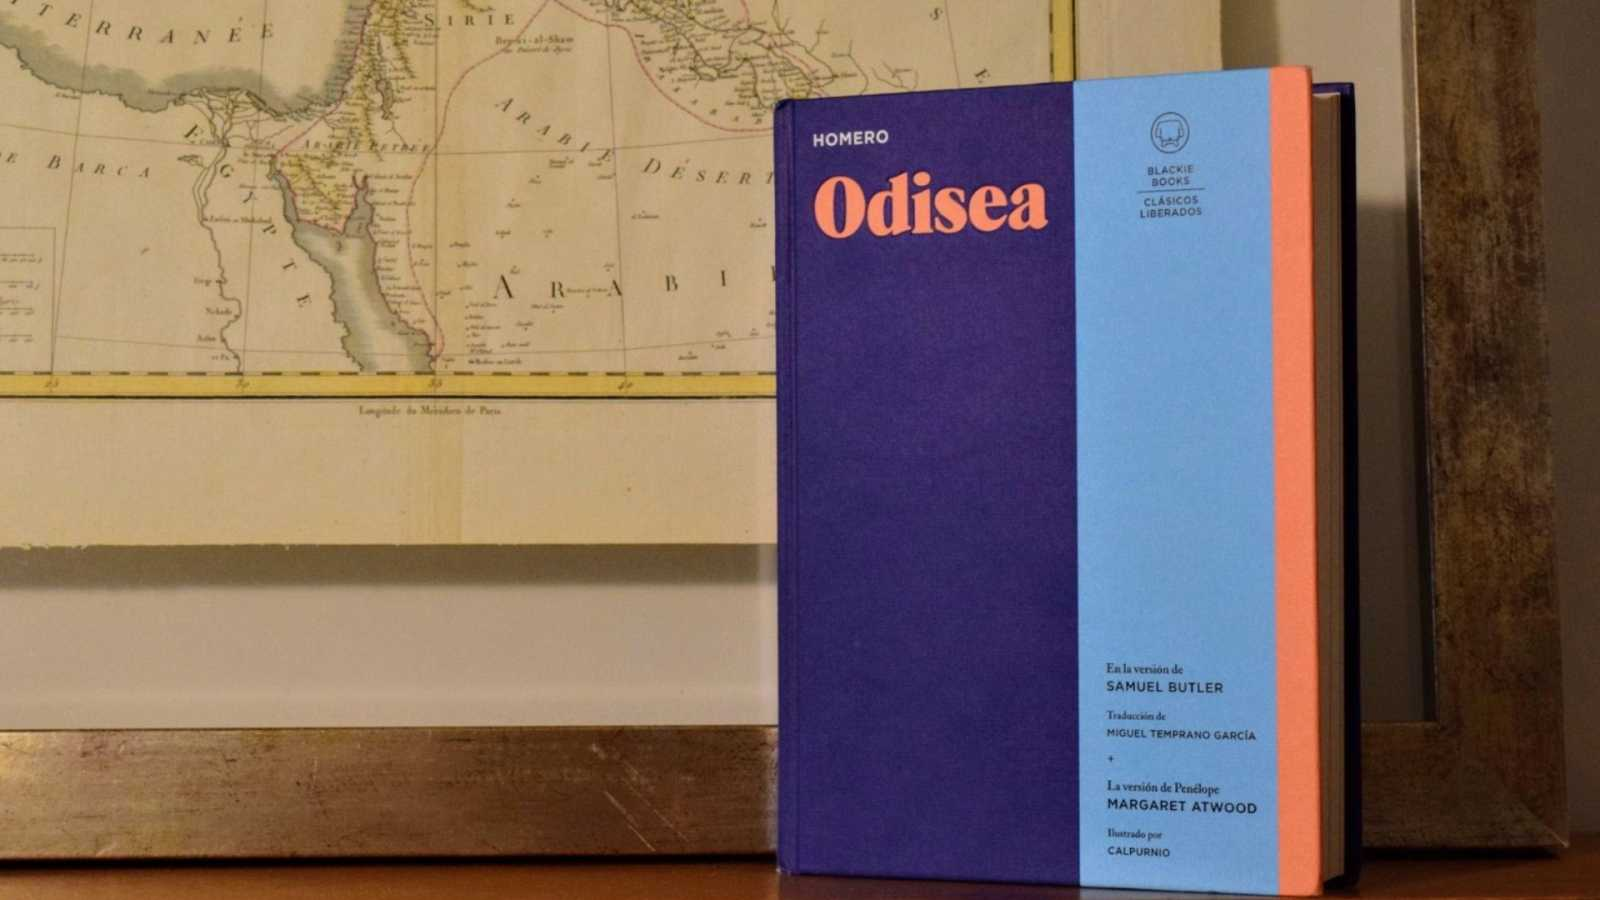 Oxiana - Homero   Odisea  - Escuchar ahora